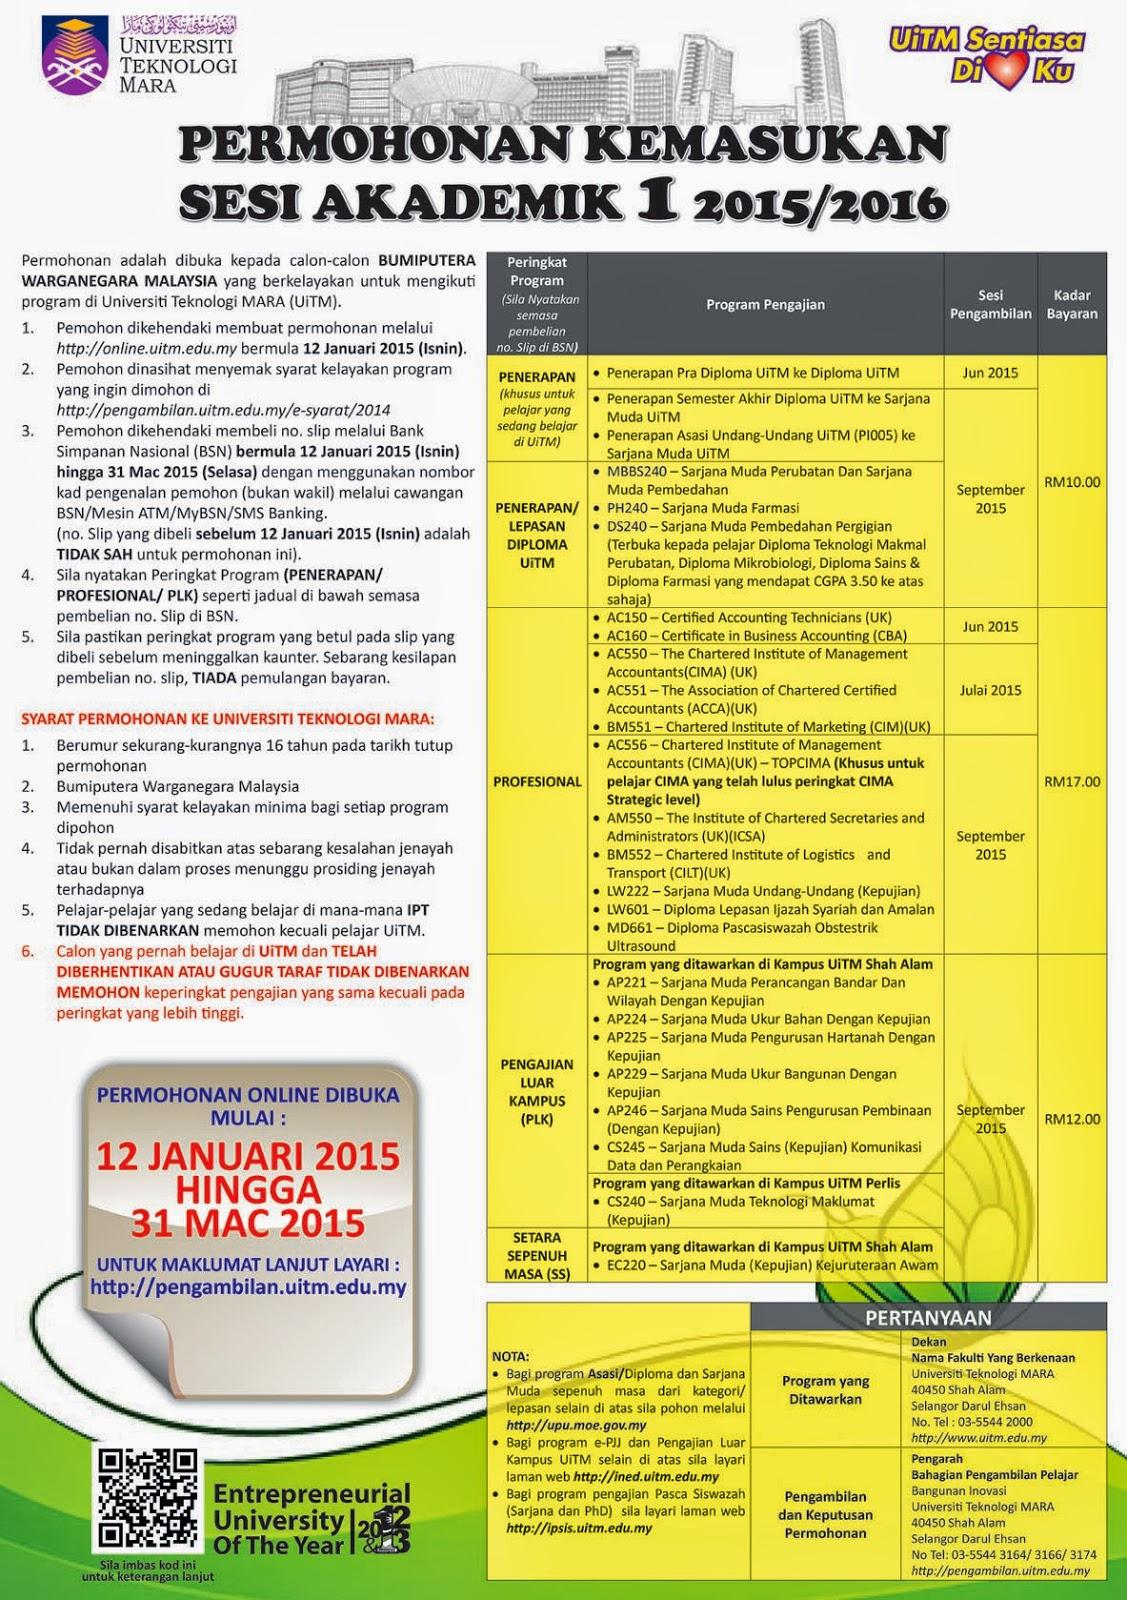 Permohonan untuk kemasukan UiTM sesi akademik 1 2015/2016